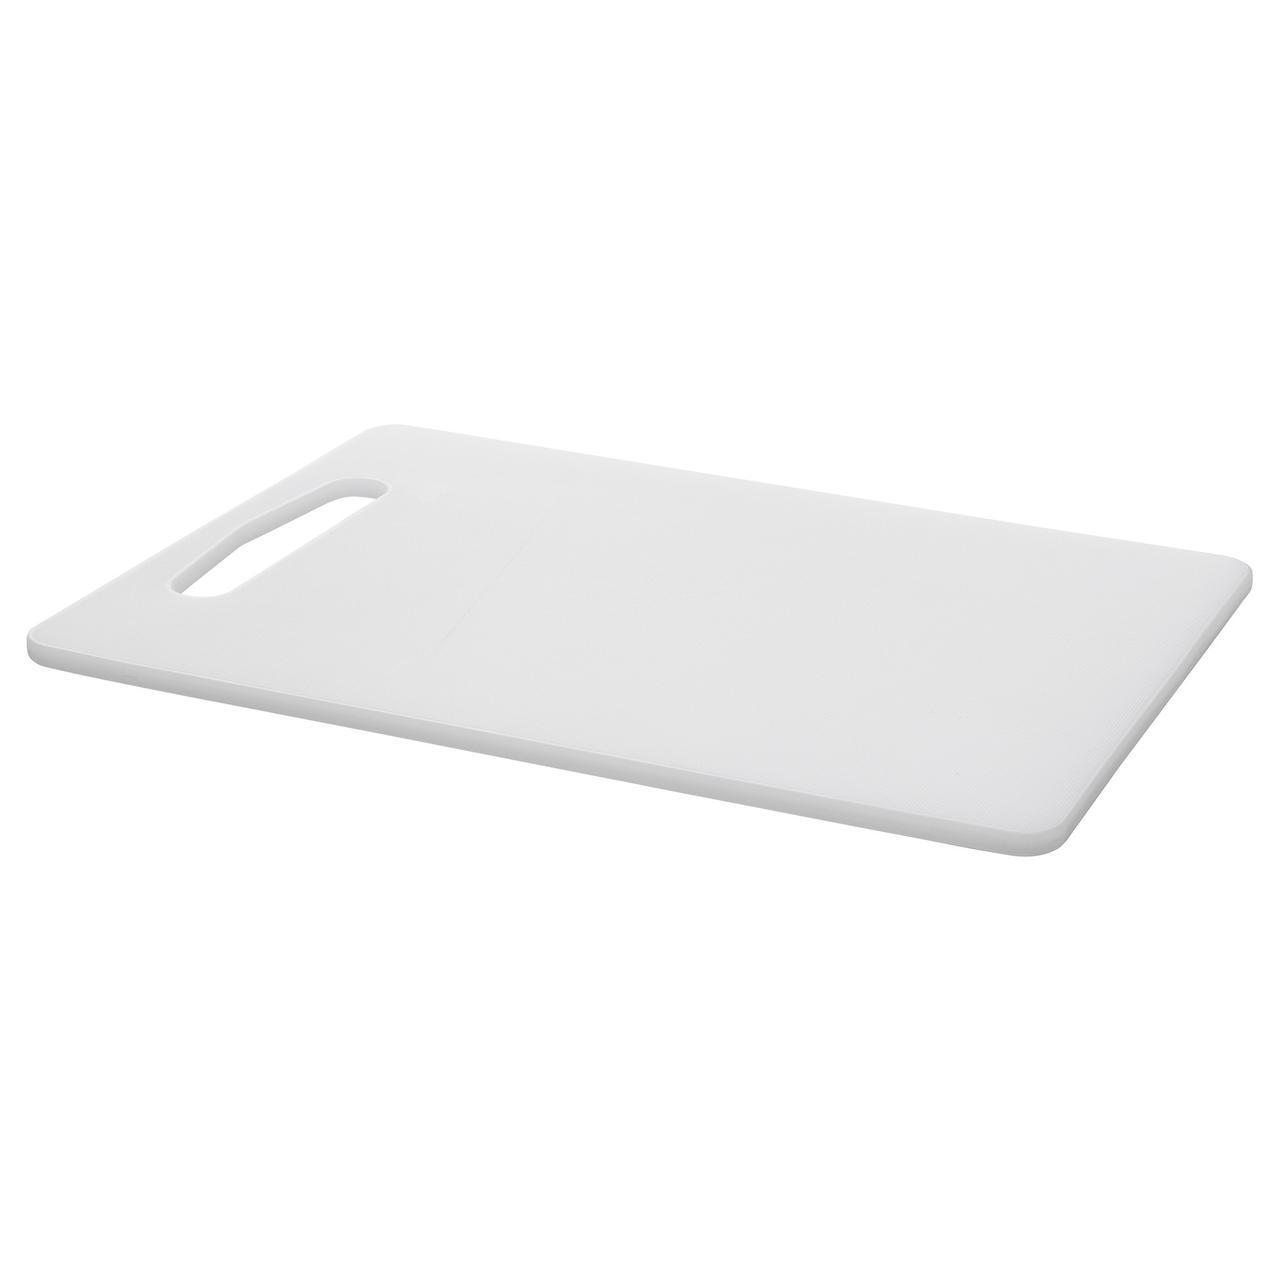 IKEA LEGITIM (902.022.68) Обробна дошка, білий